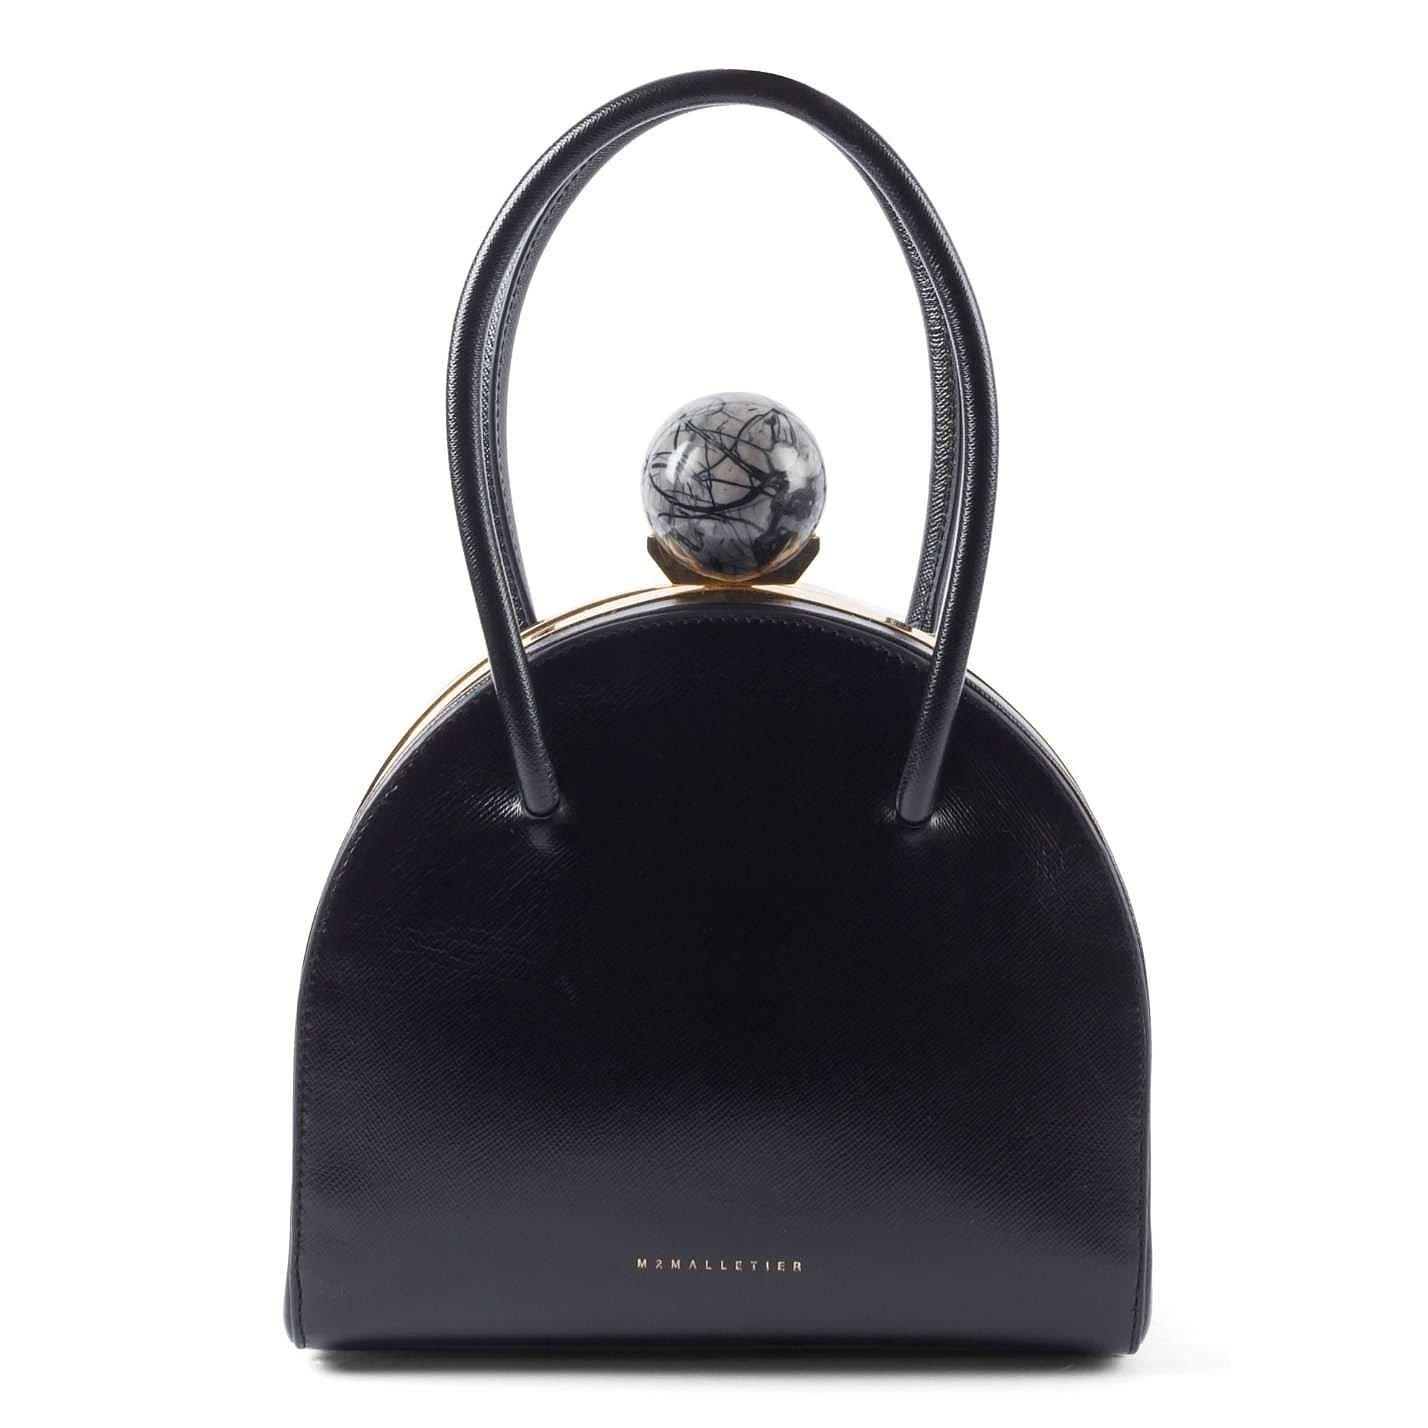 M2MALLETIER Leather Top Handle Bag